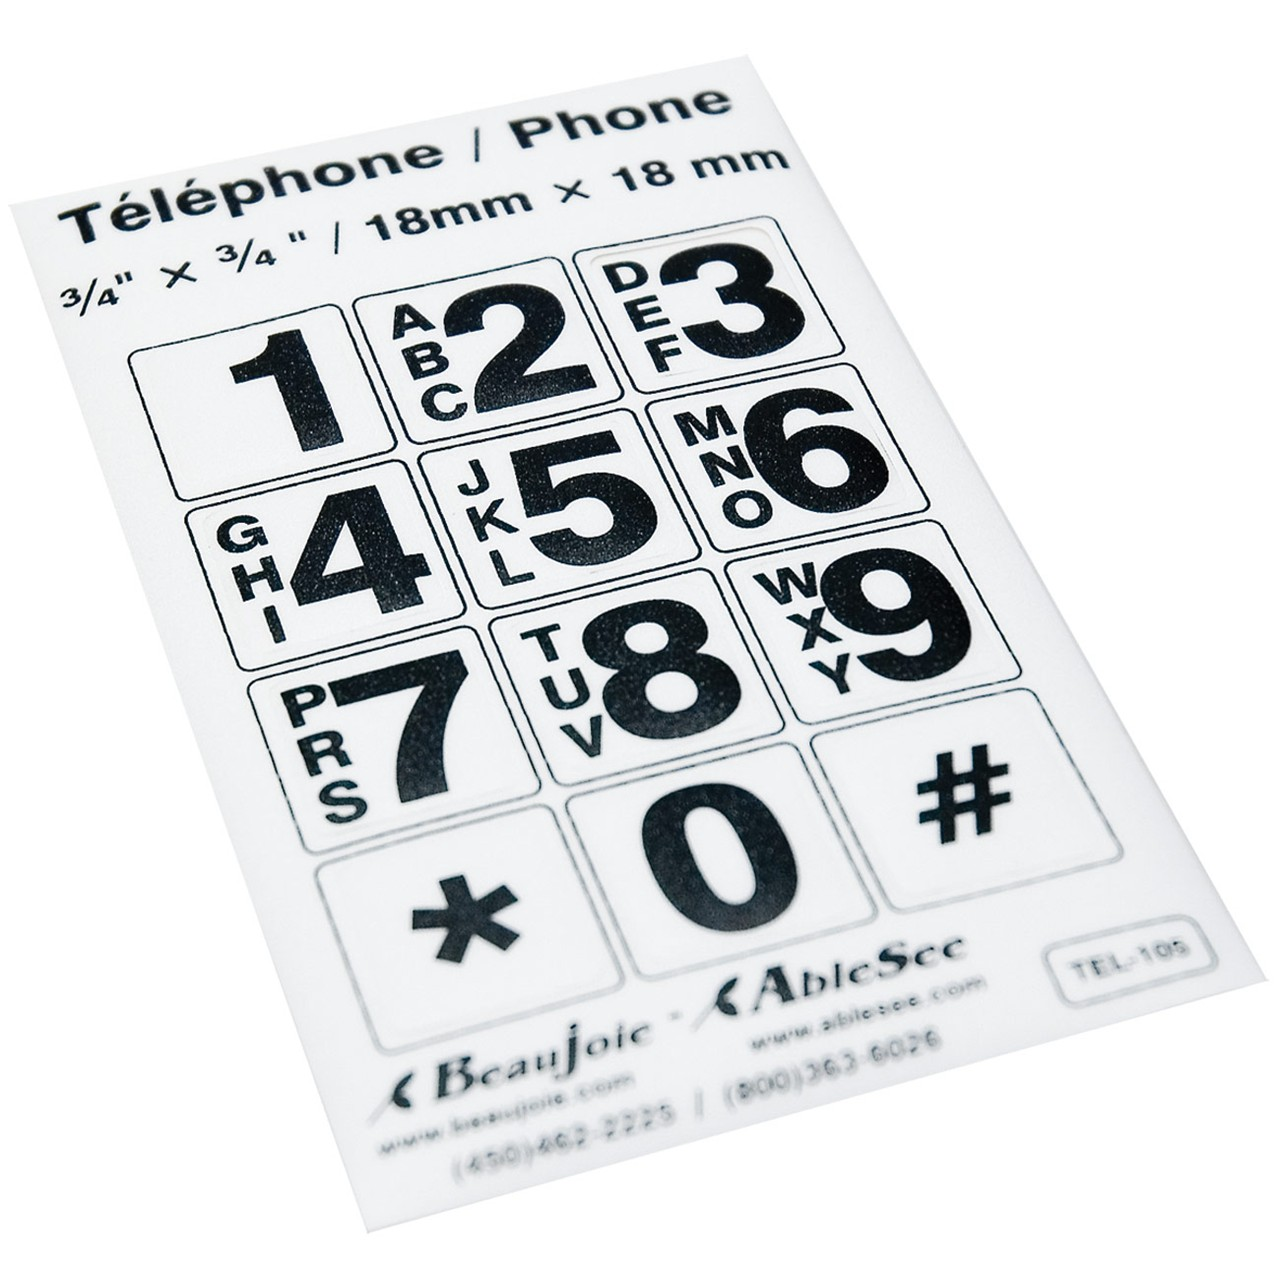 Telephone stickers black on white alphanumeric